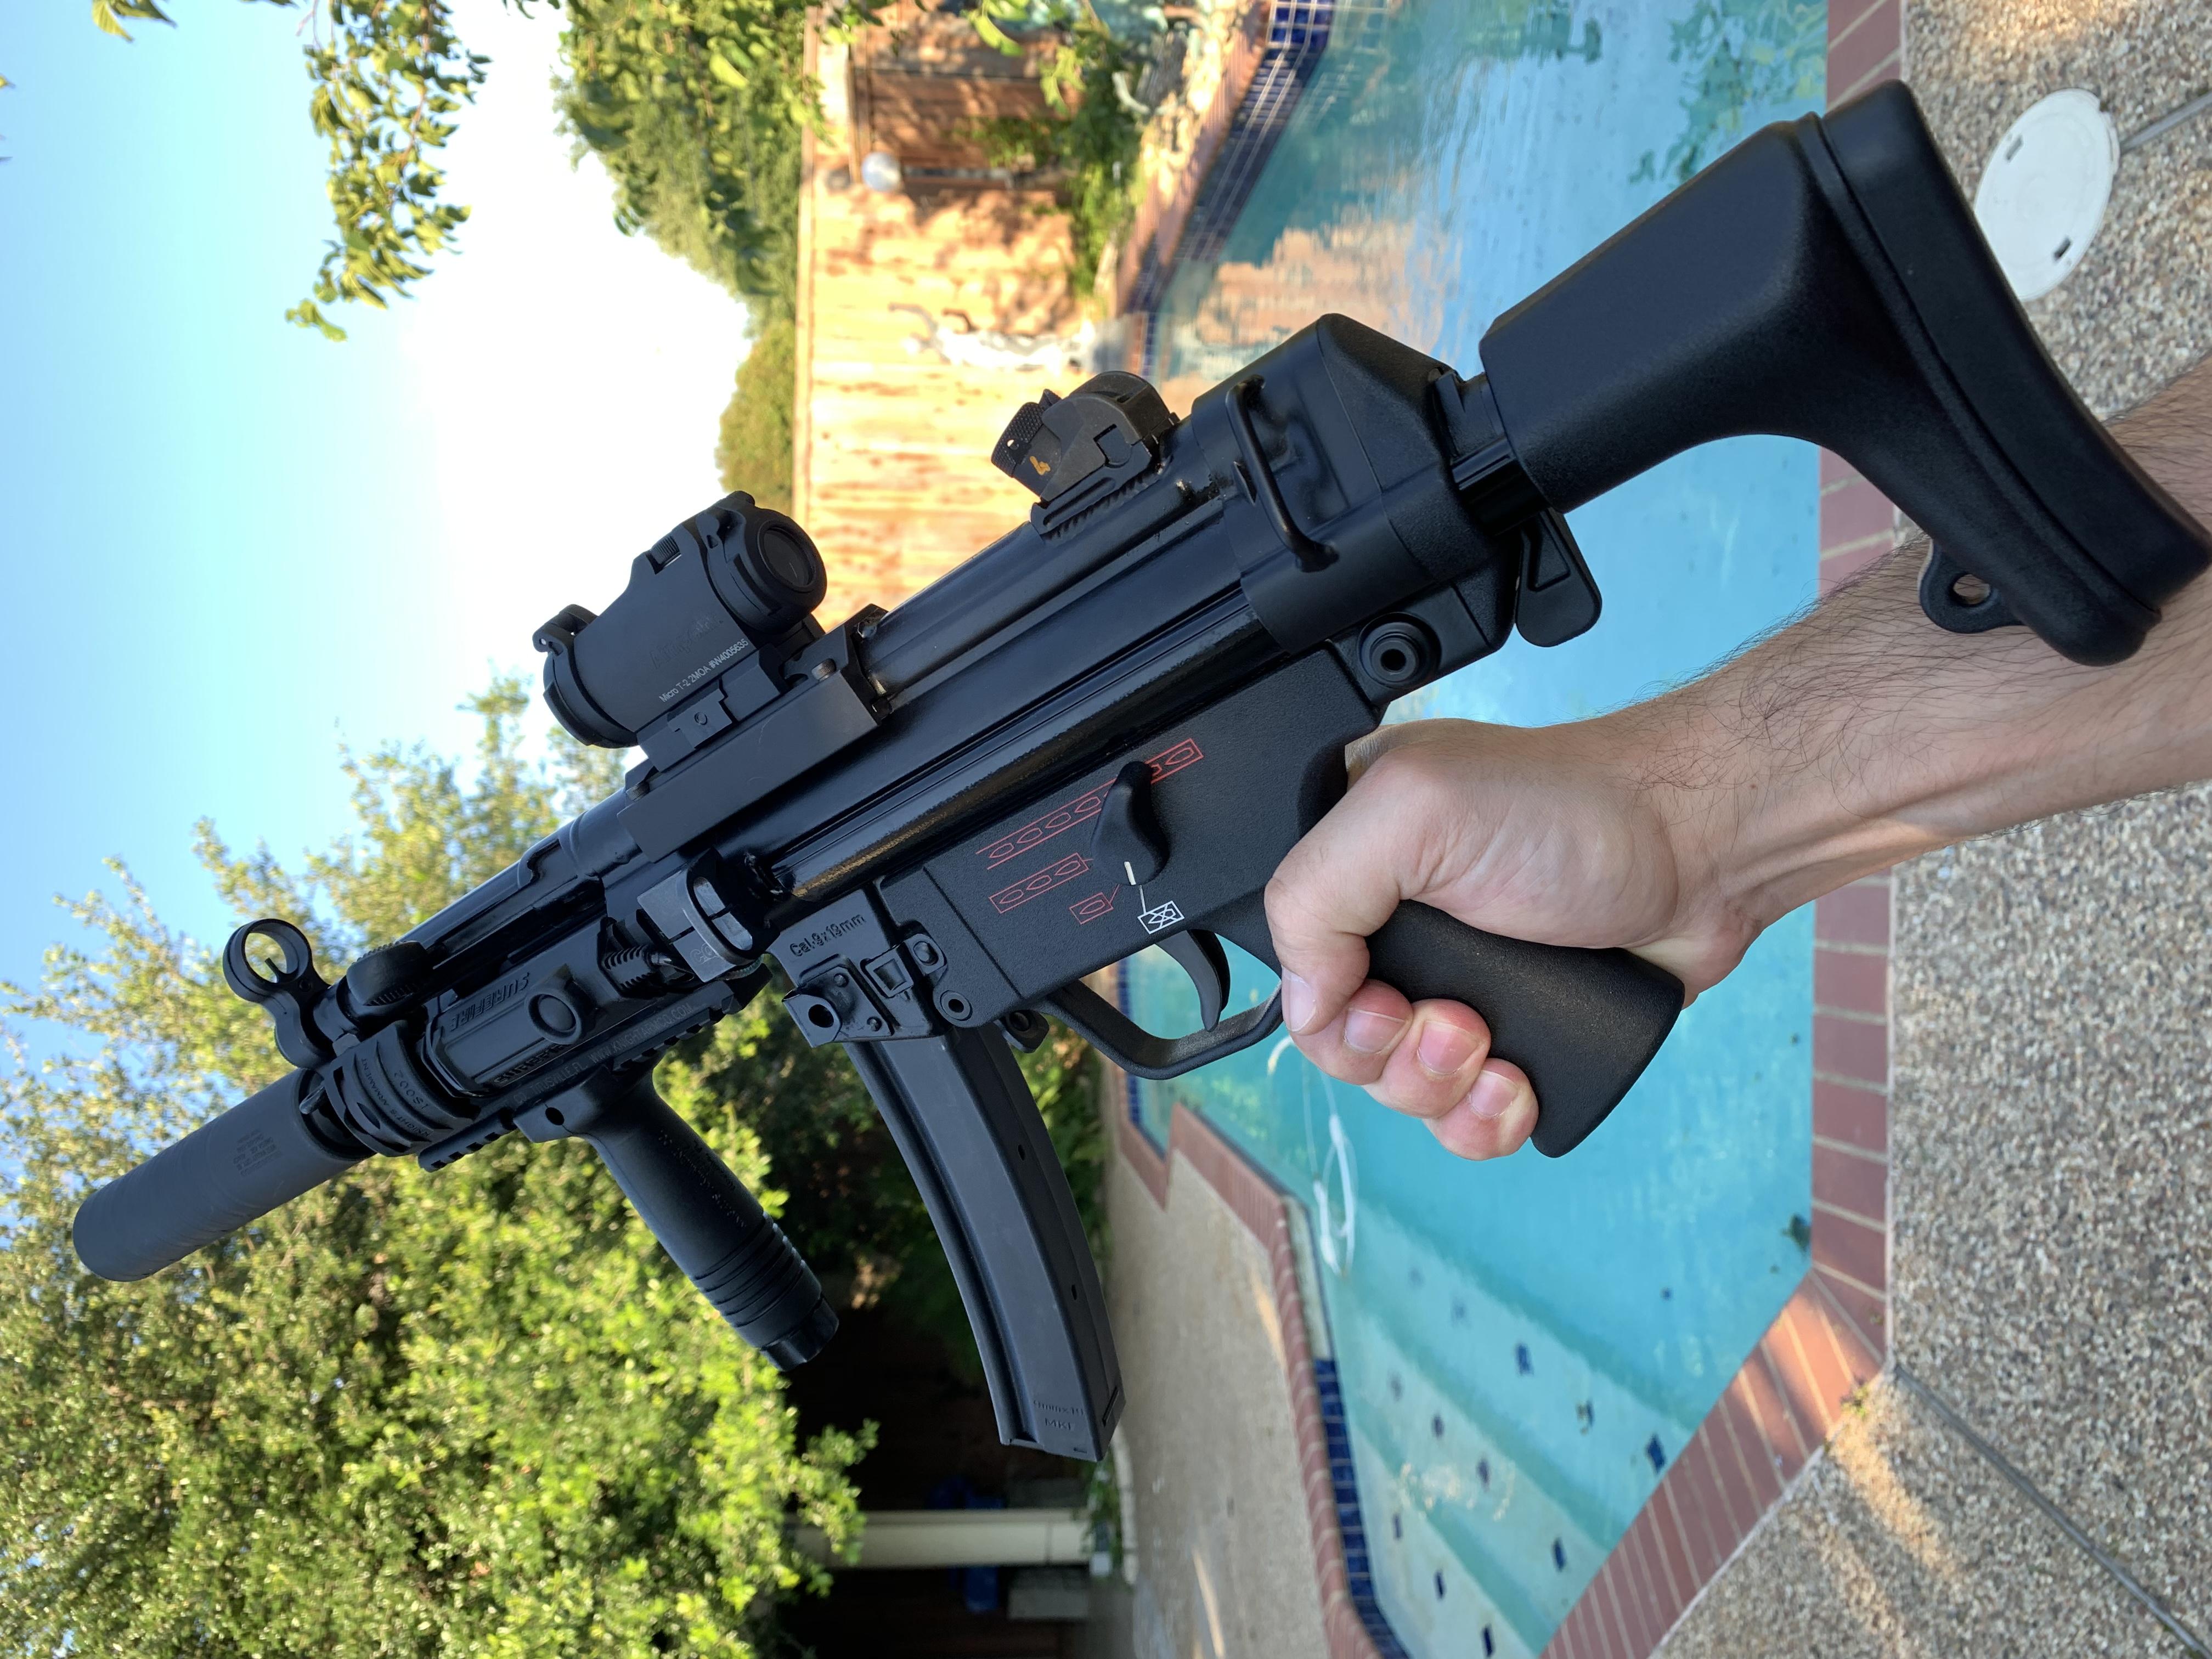 Let's See Your MP5's!-f34cbff7-a42f-4c38-8ad8-72987c42af92.jpeg